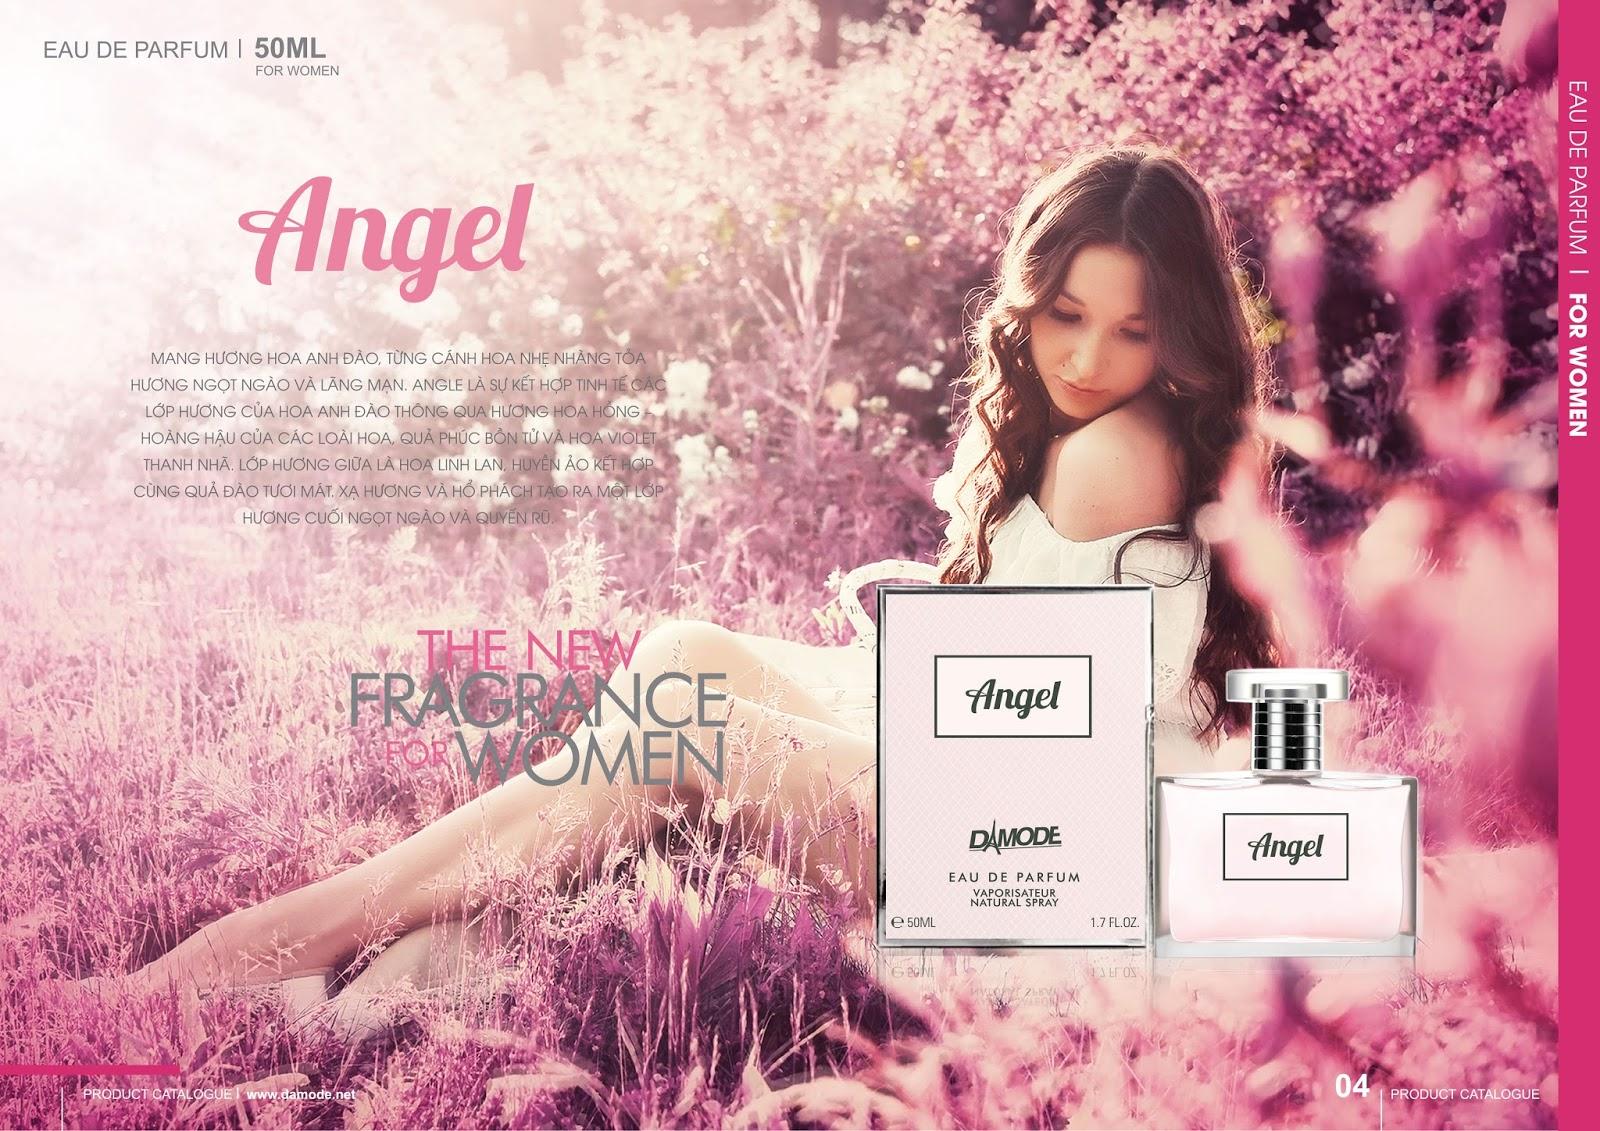 Nước hoa Damode Angel